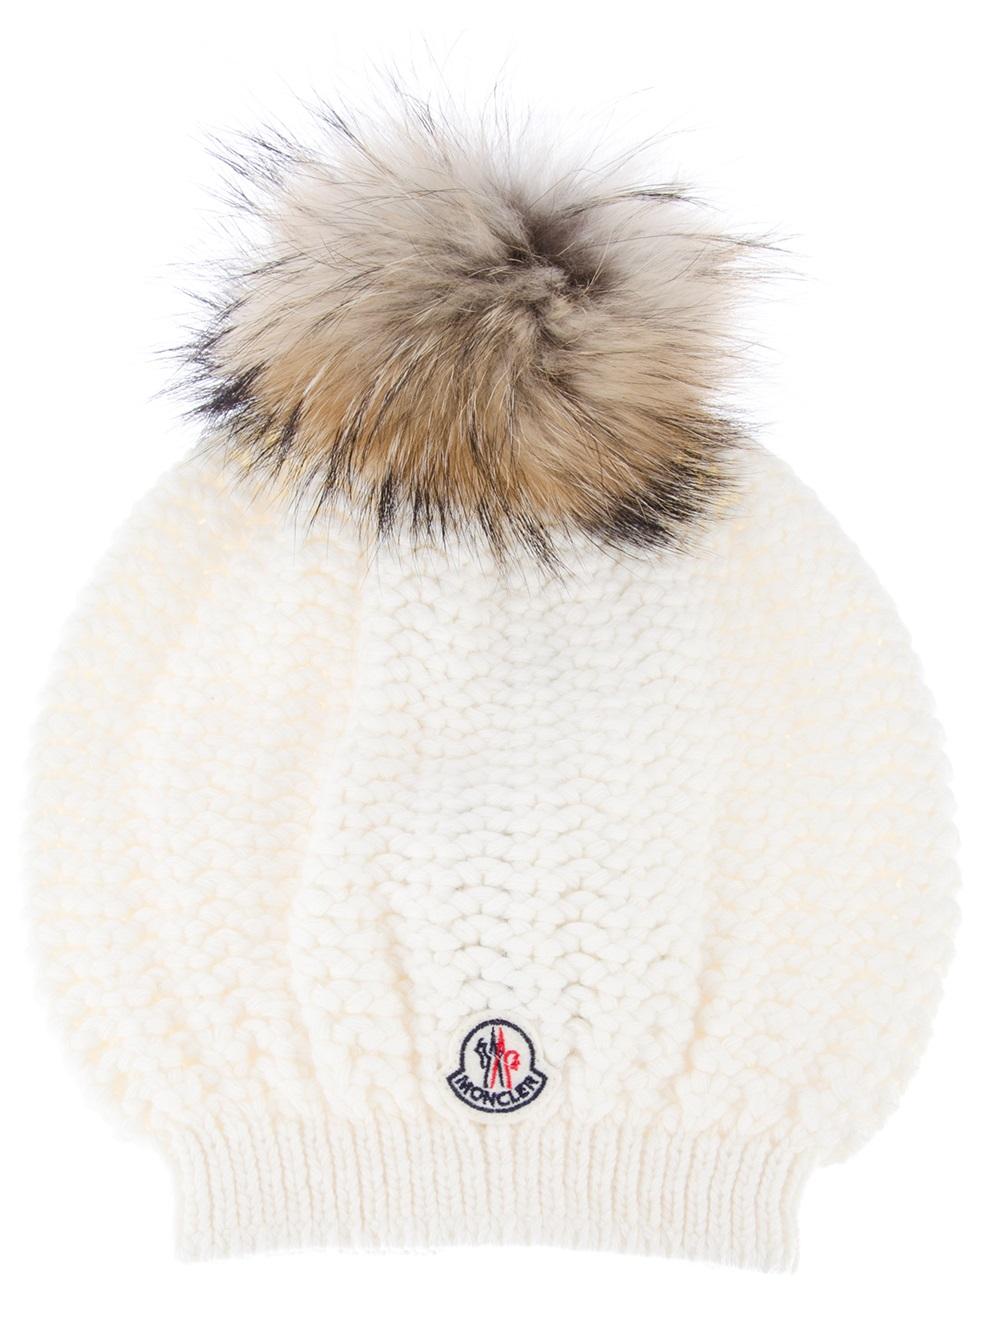 Lyst - Moncler Fur Bobble Hat in White cba857a4cd1